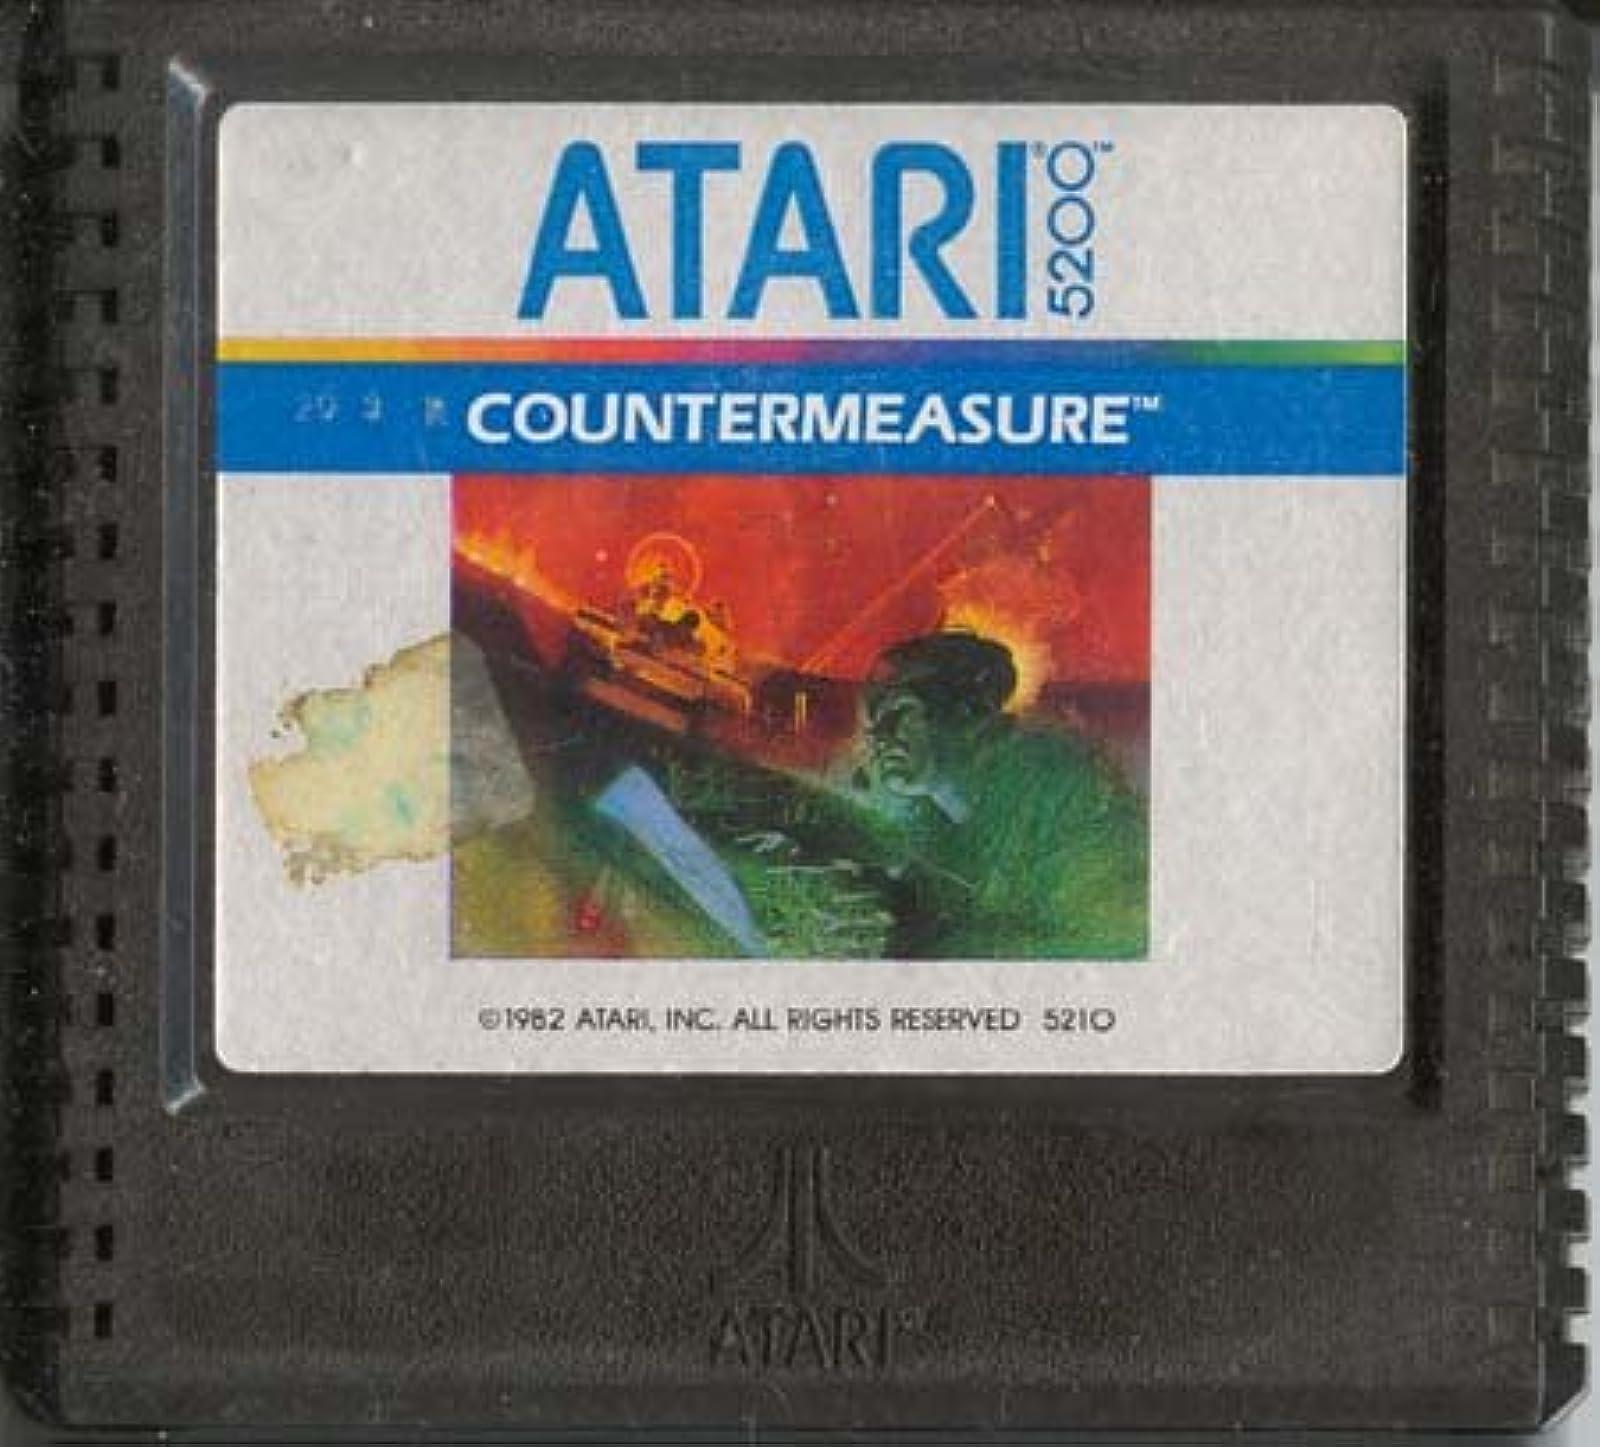 Countermeasure For Atari Vintage Arcade